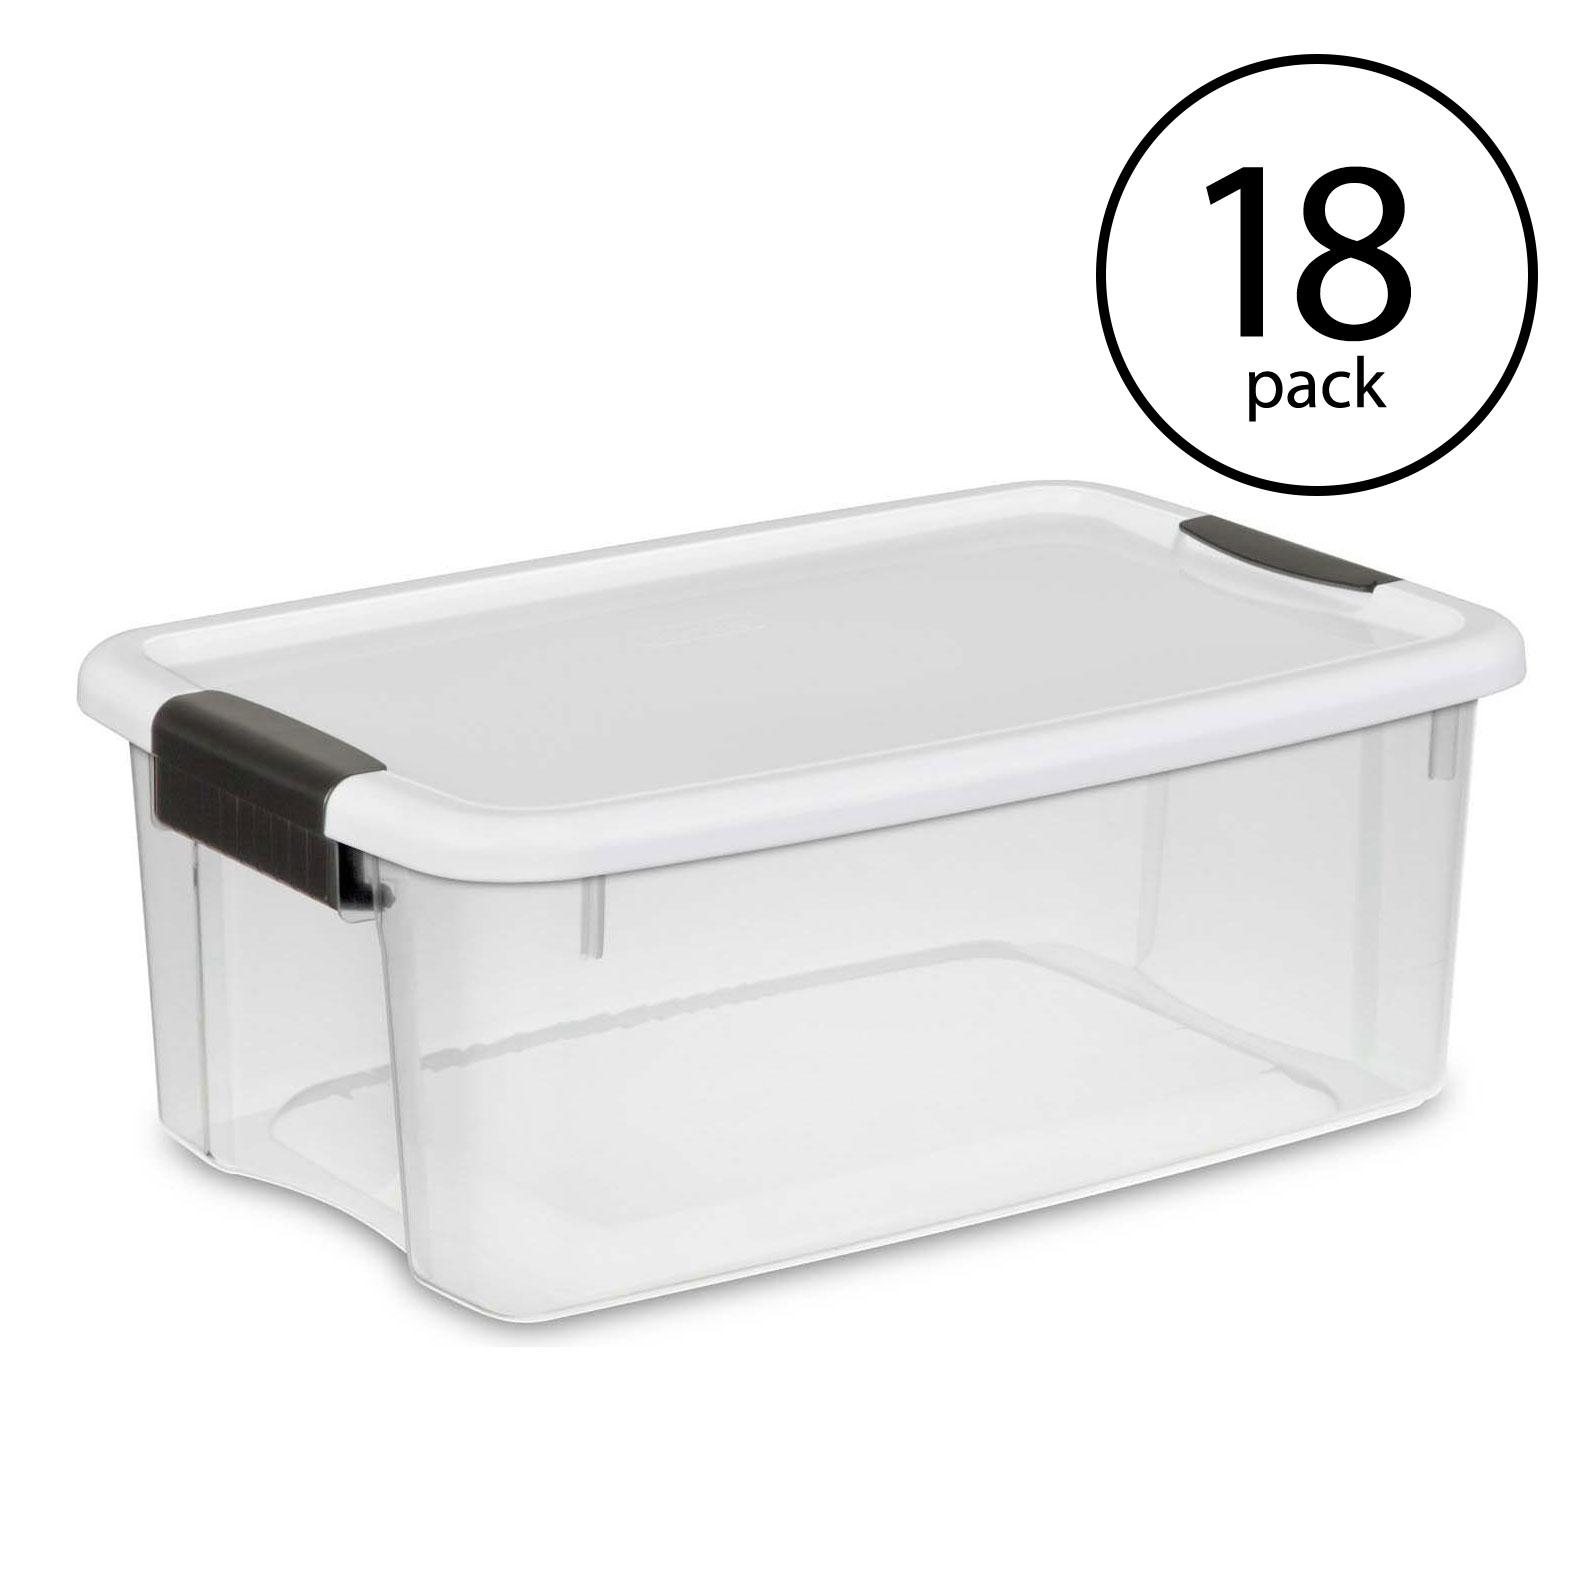 4-Pk Sterilite 70 Quart Ultra Latch Storage Box Open Box White Lid